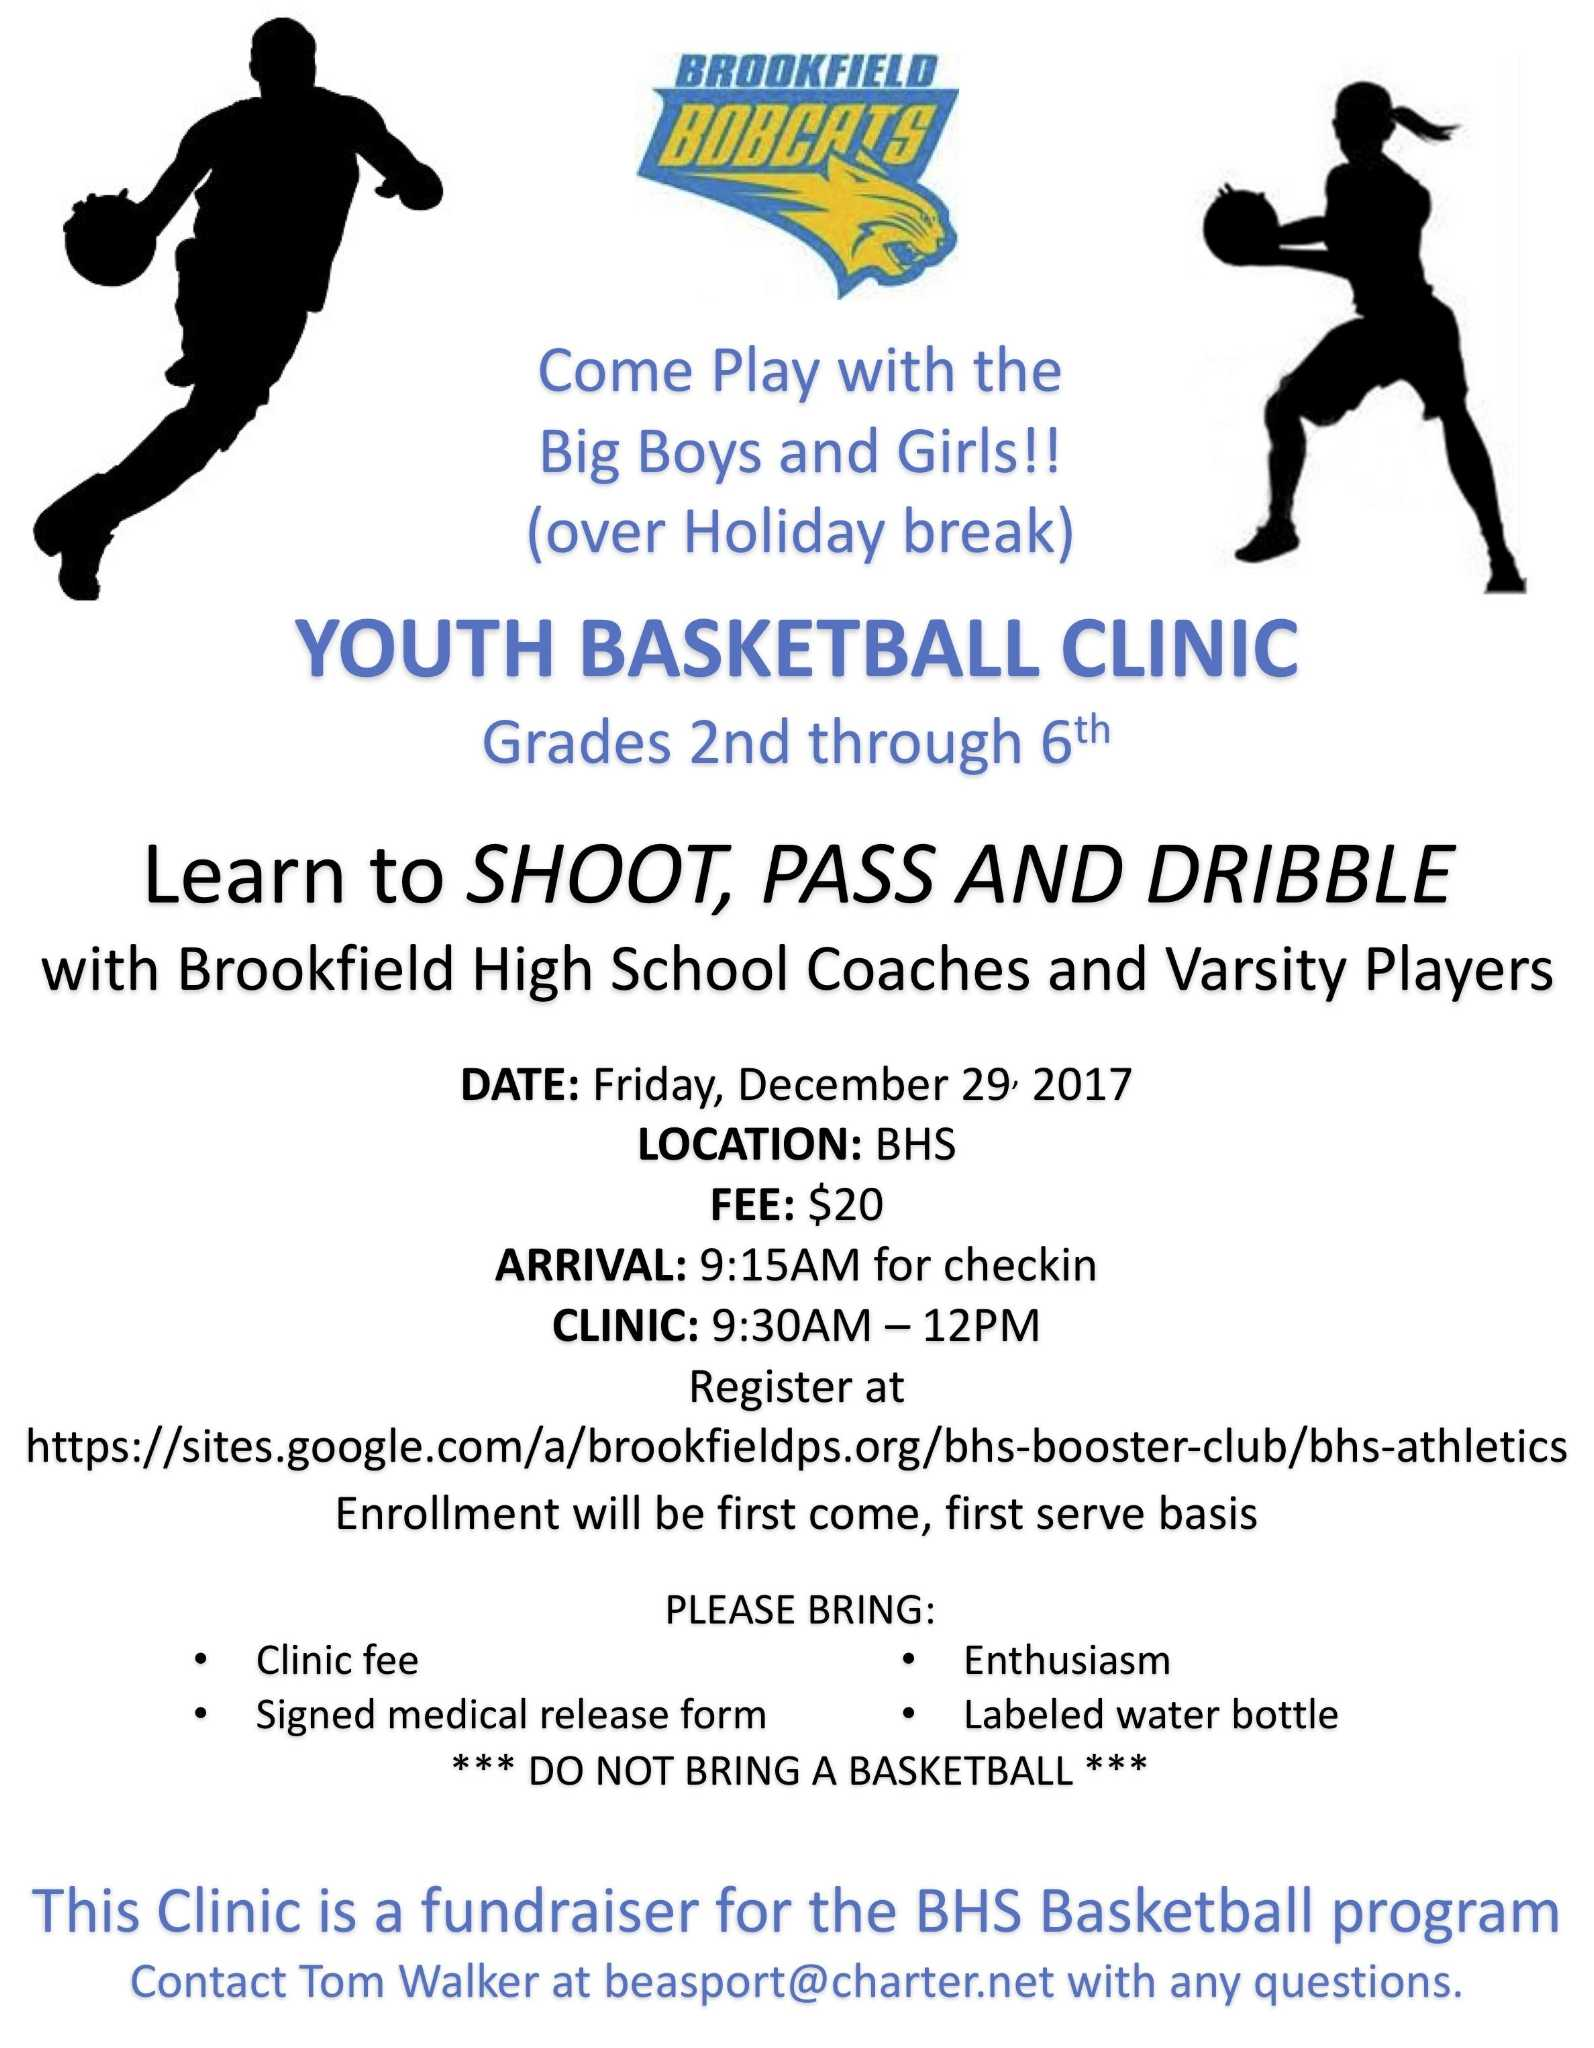 Brookfield High school basketball coaches, players offer